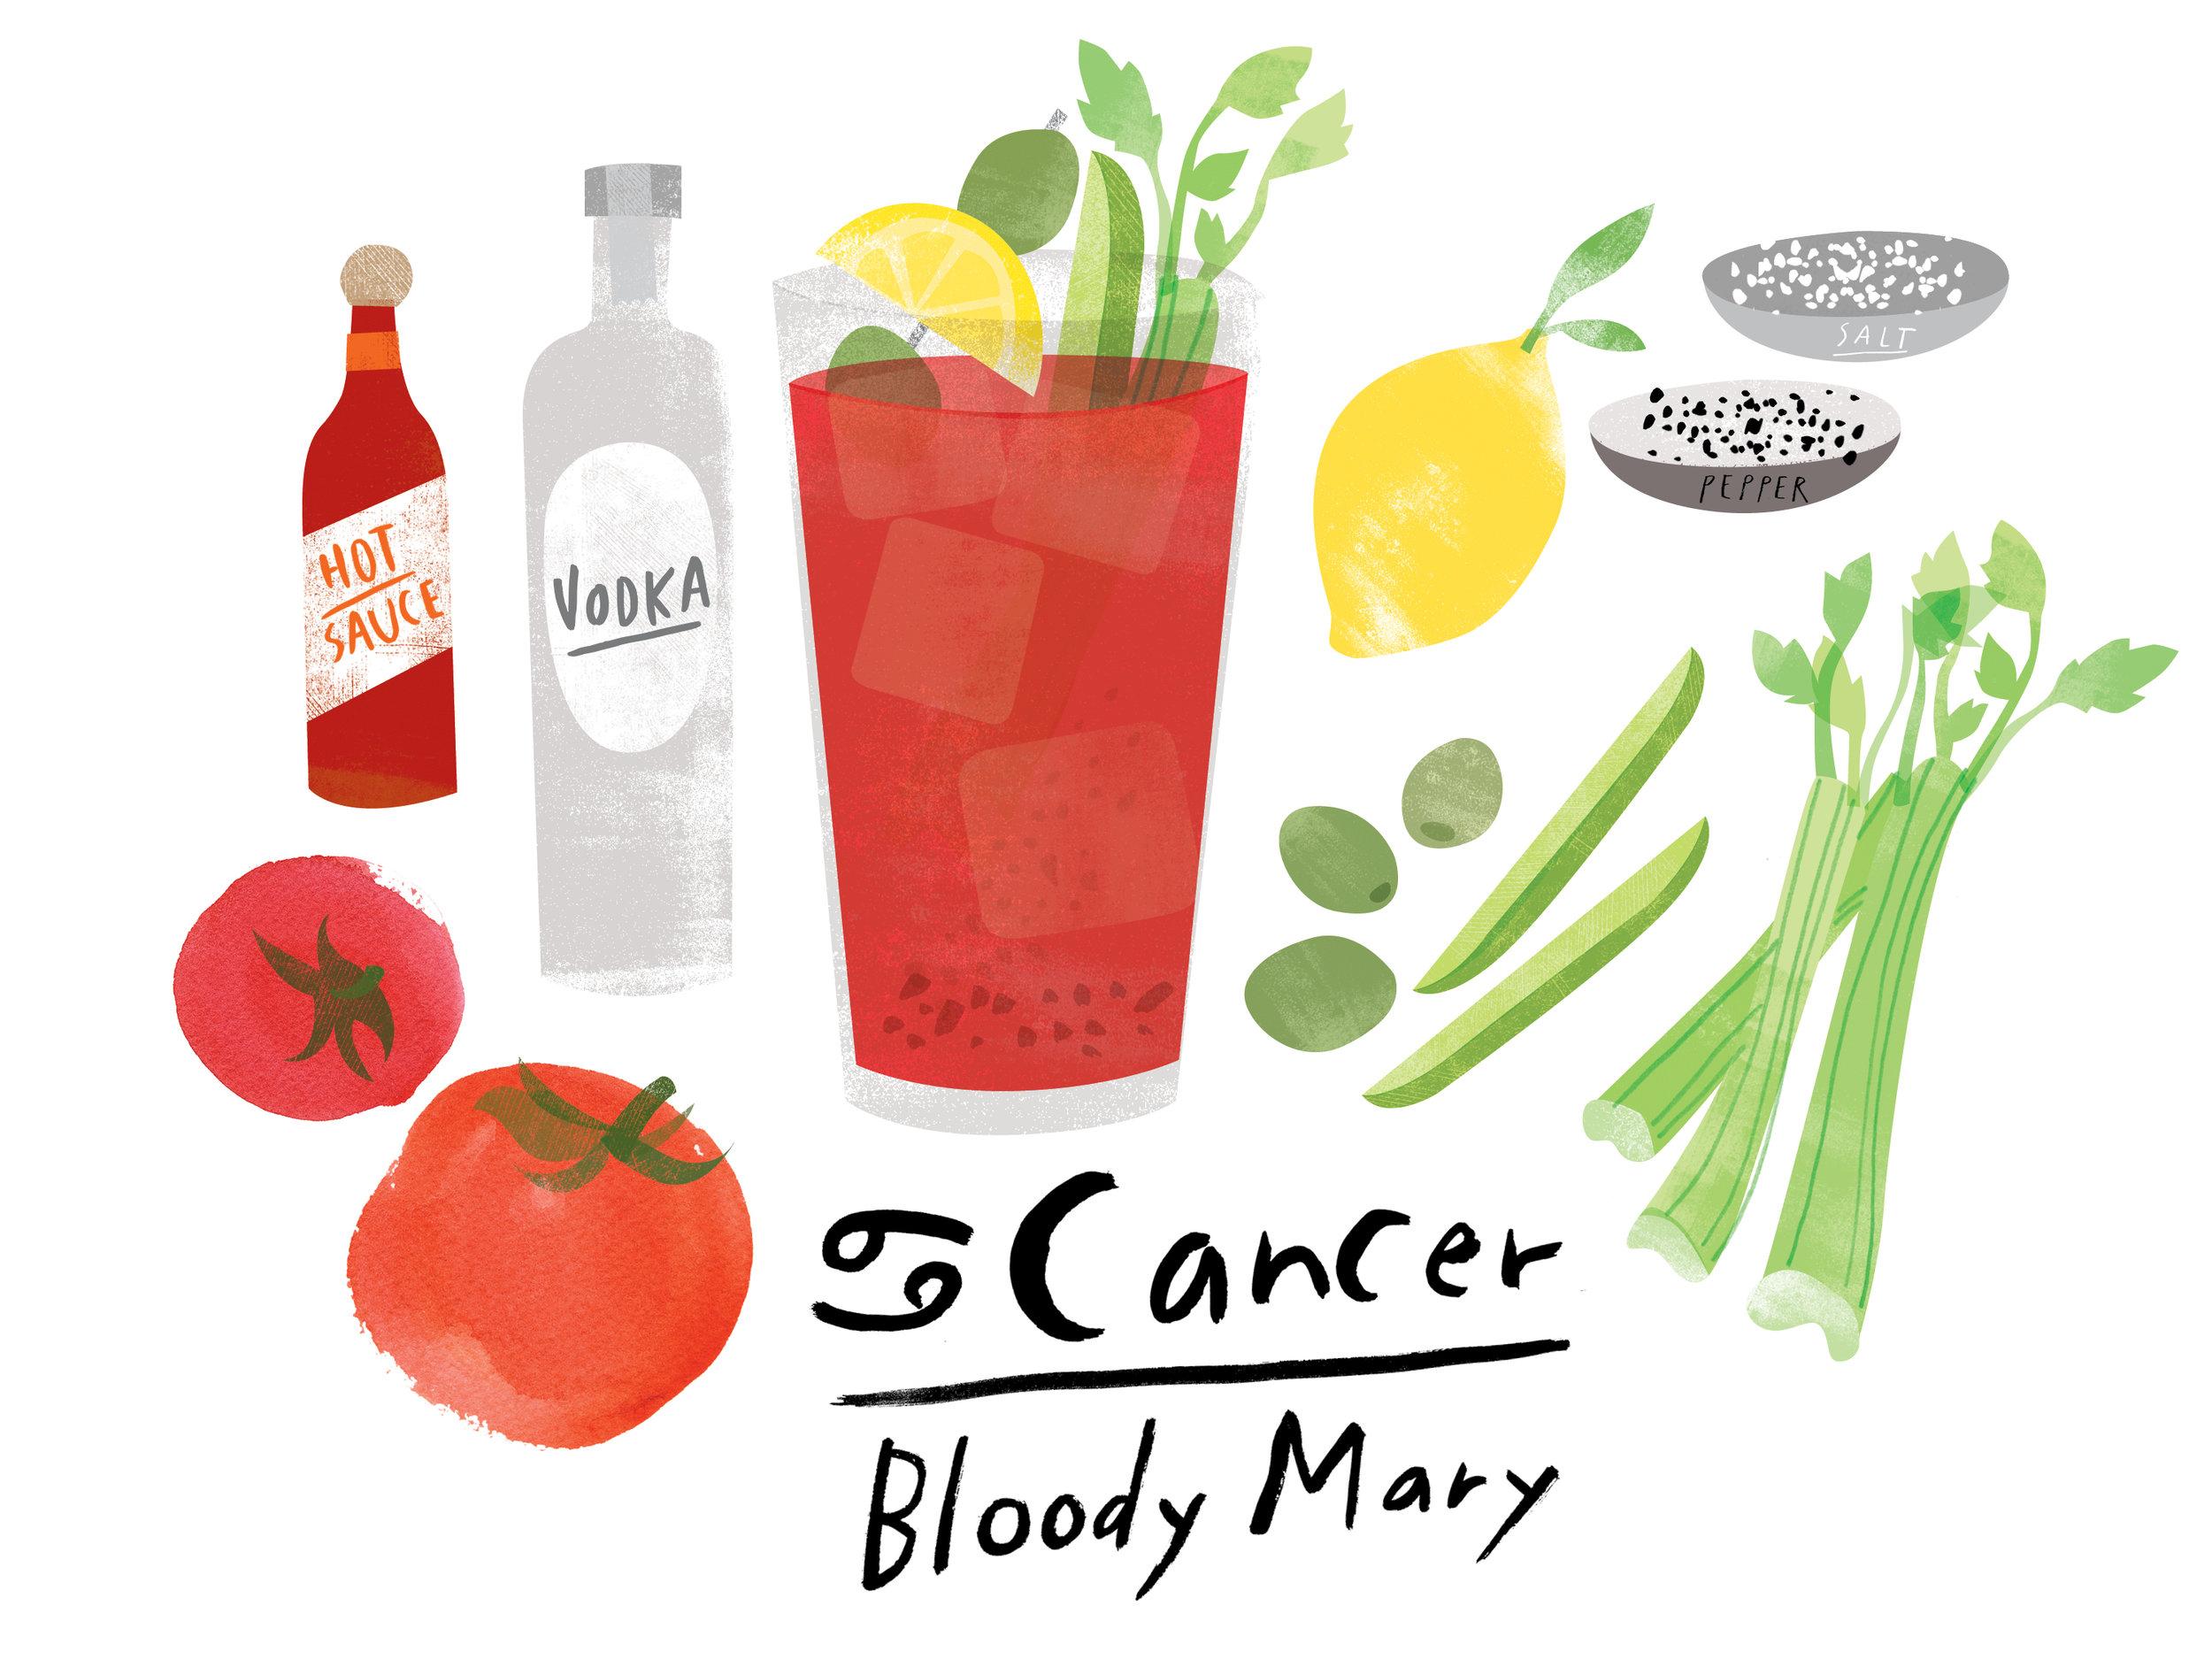 cocktails_horoscope_cancer4.jpg